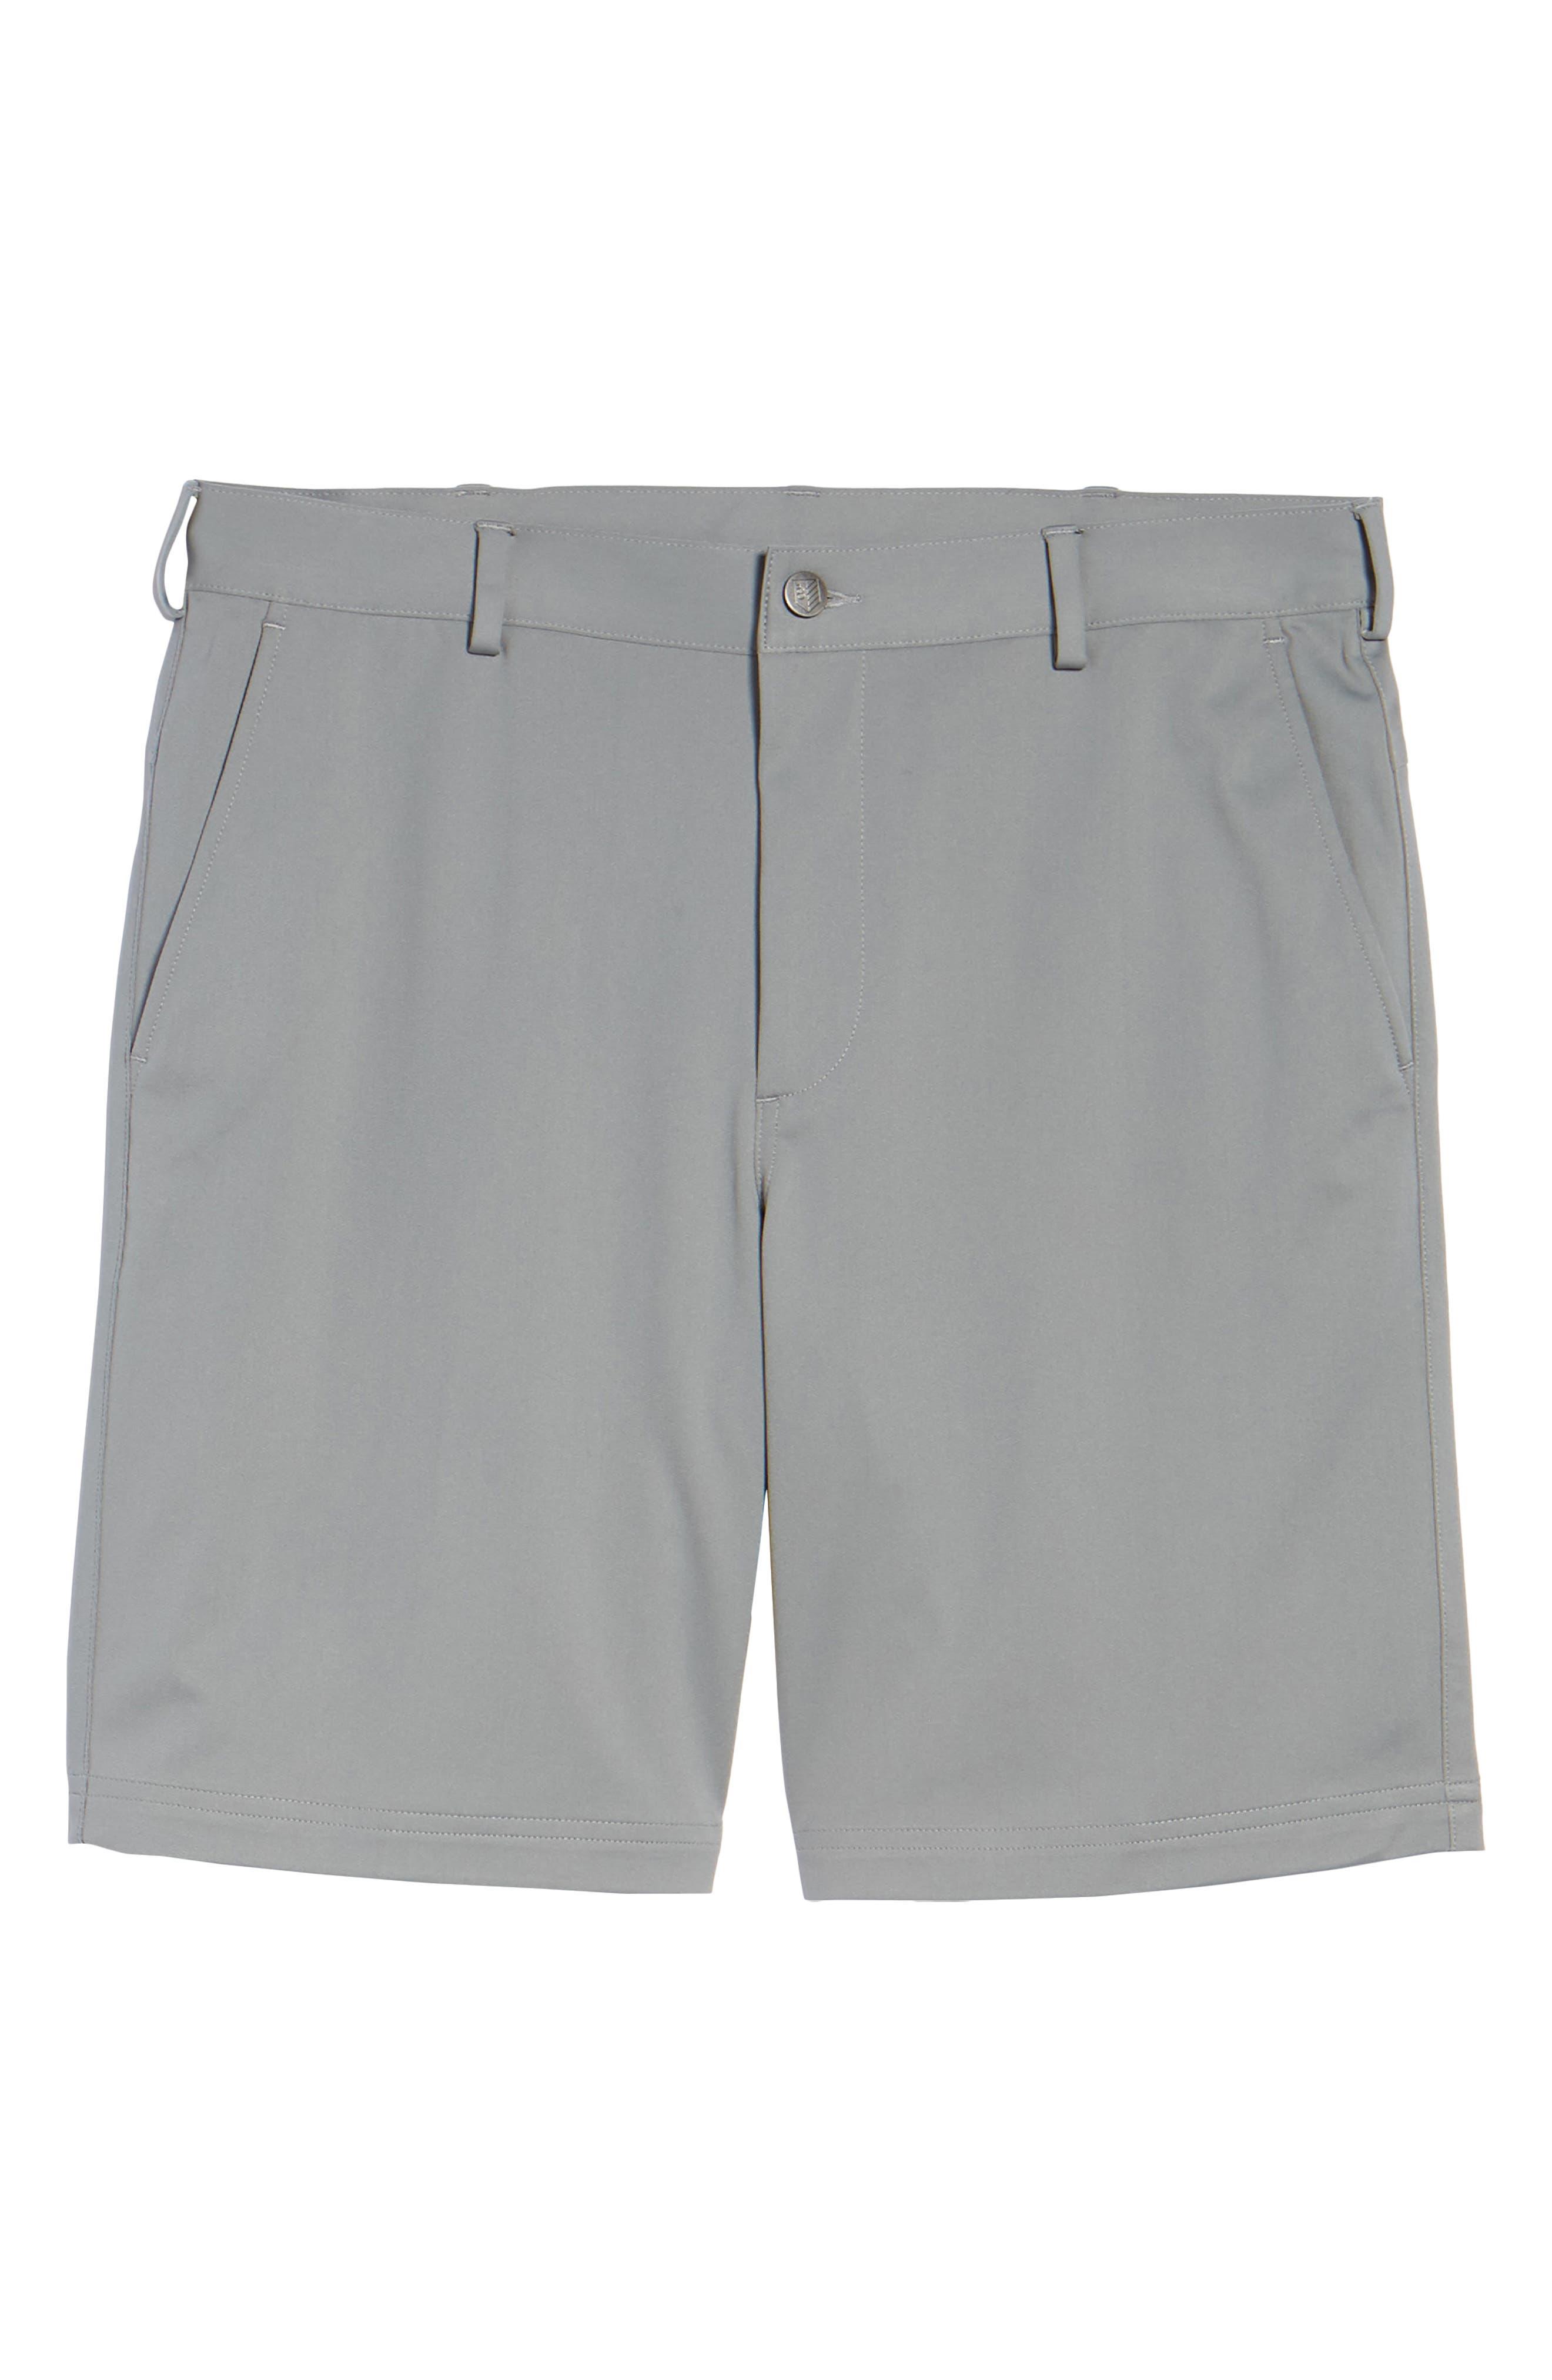 Trim Fit Tech Chino Shorts,                             Alternate thumbnail 6, color,                             Graphite Heather